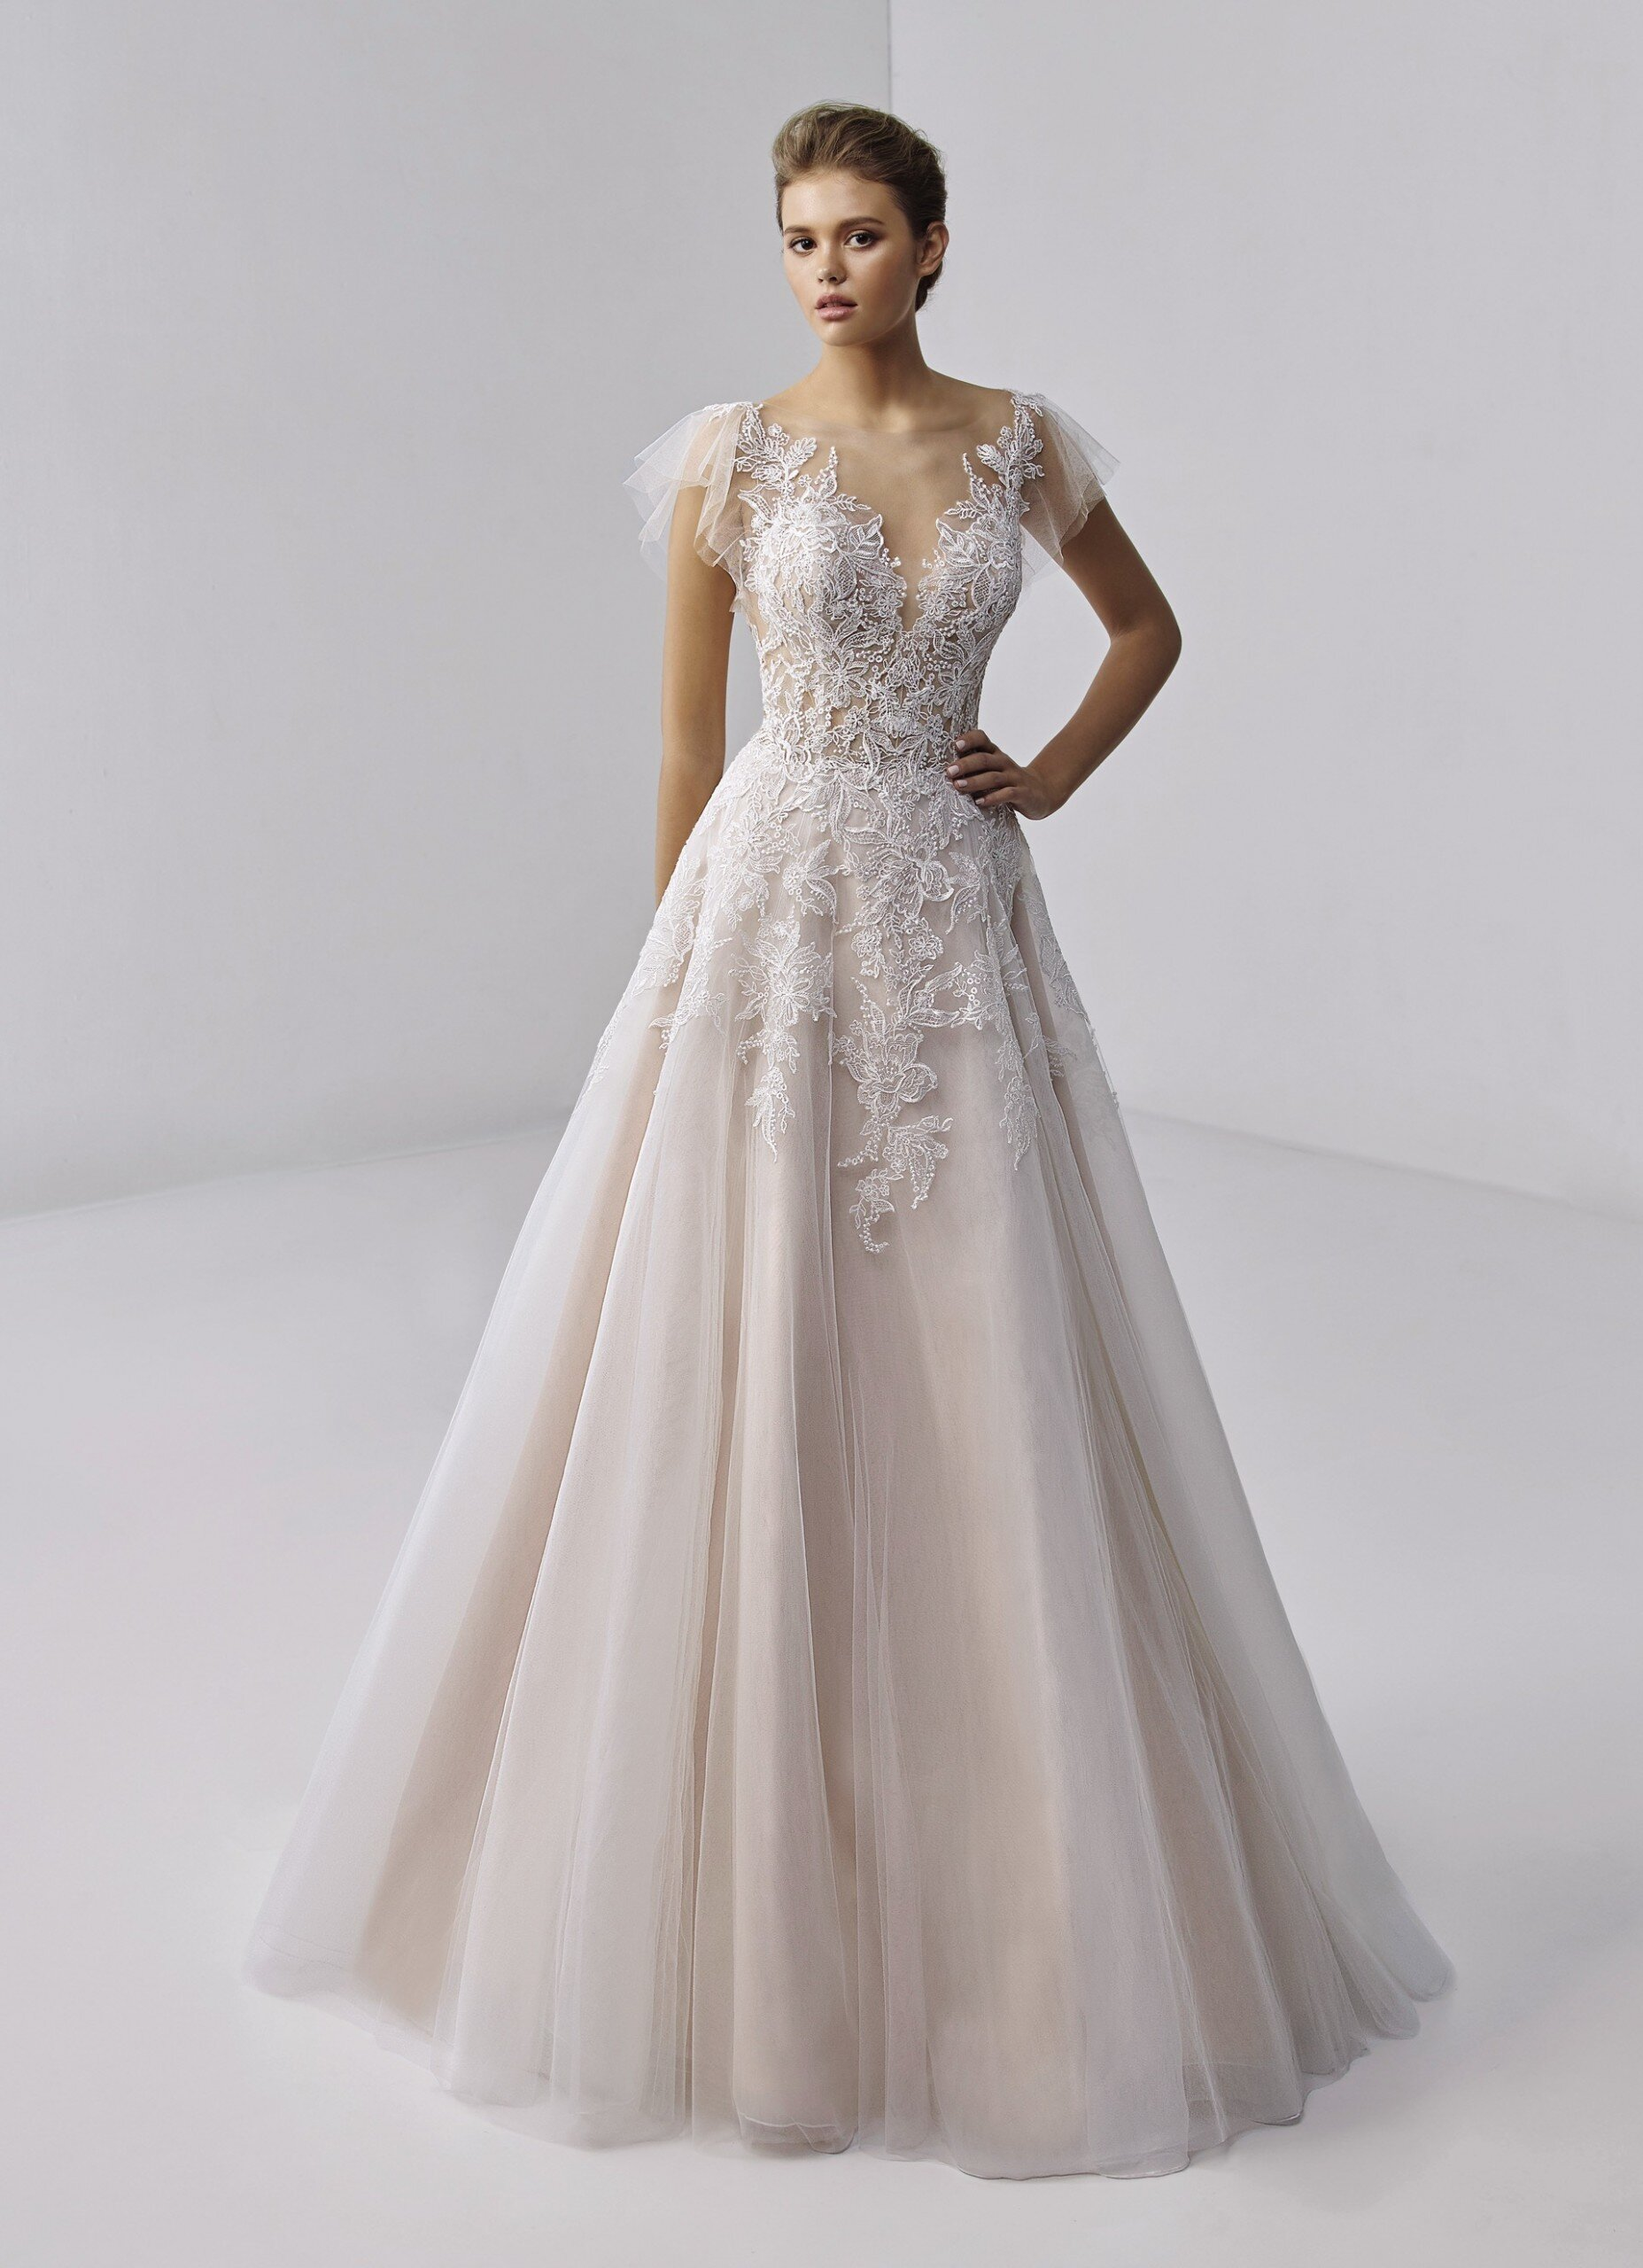 Etoile Brautmode Kollektion 2021 Modell Aimee